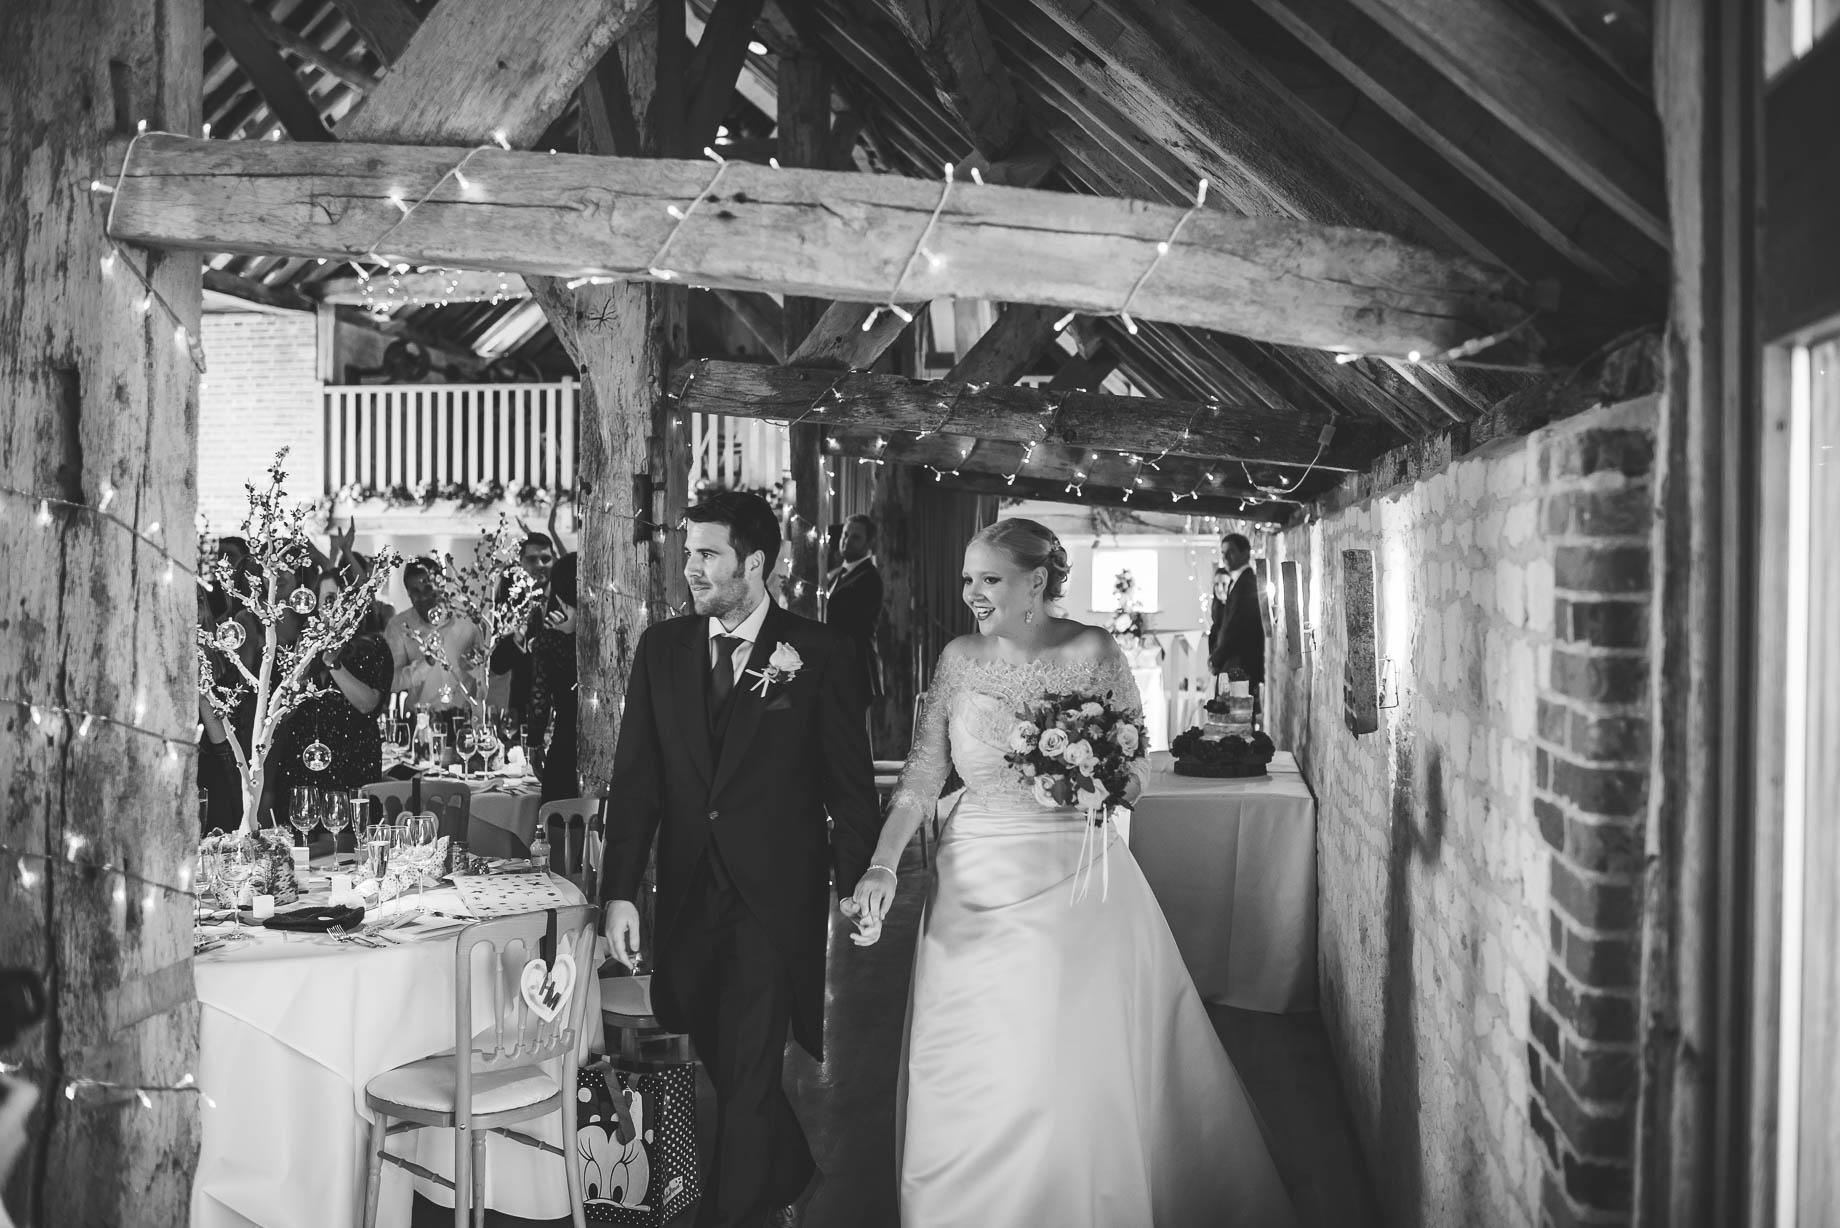 Bury Court Barn wedding photography - Guy Collier - Hannah and Mark (137 of 191)